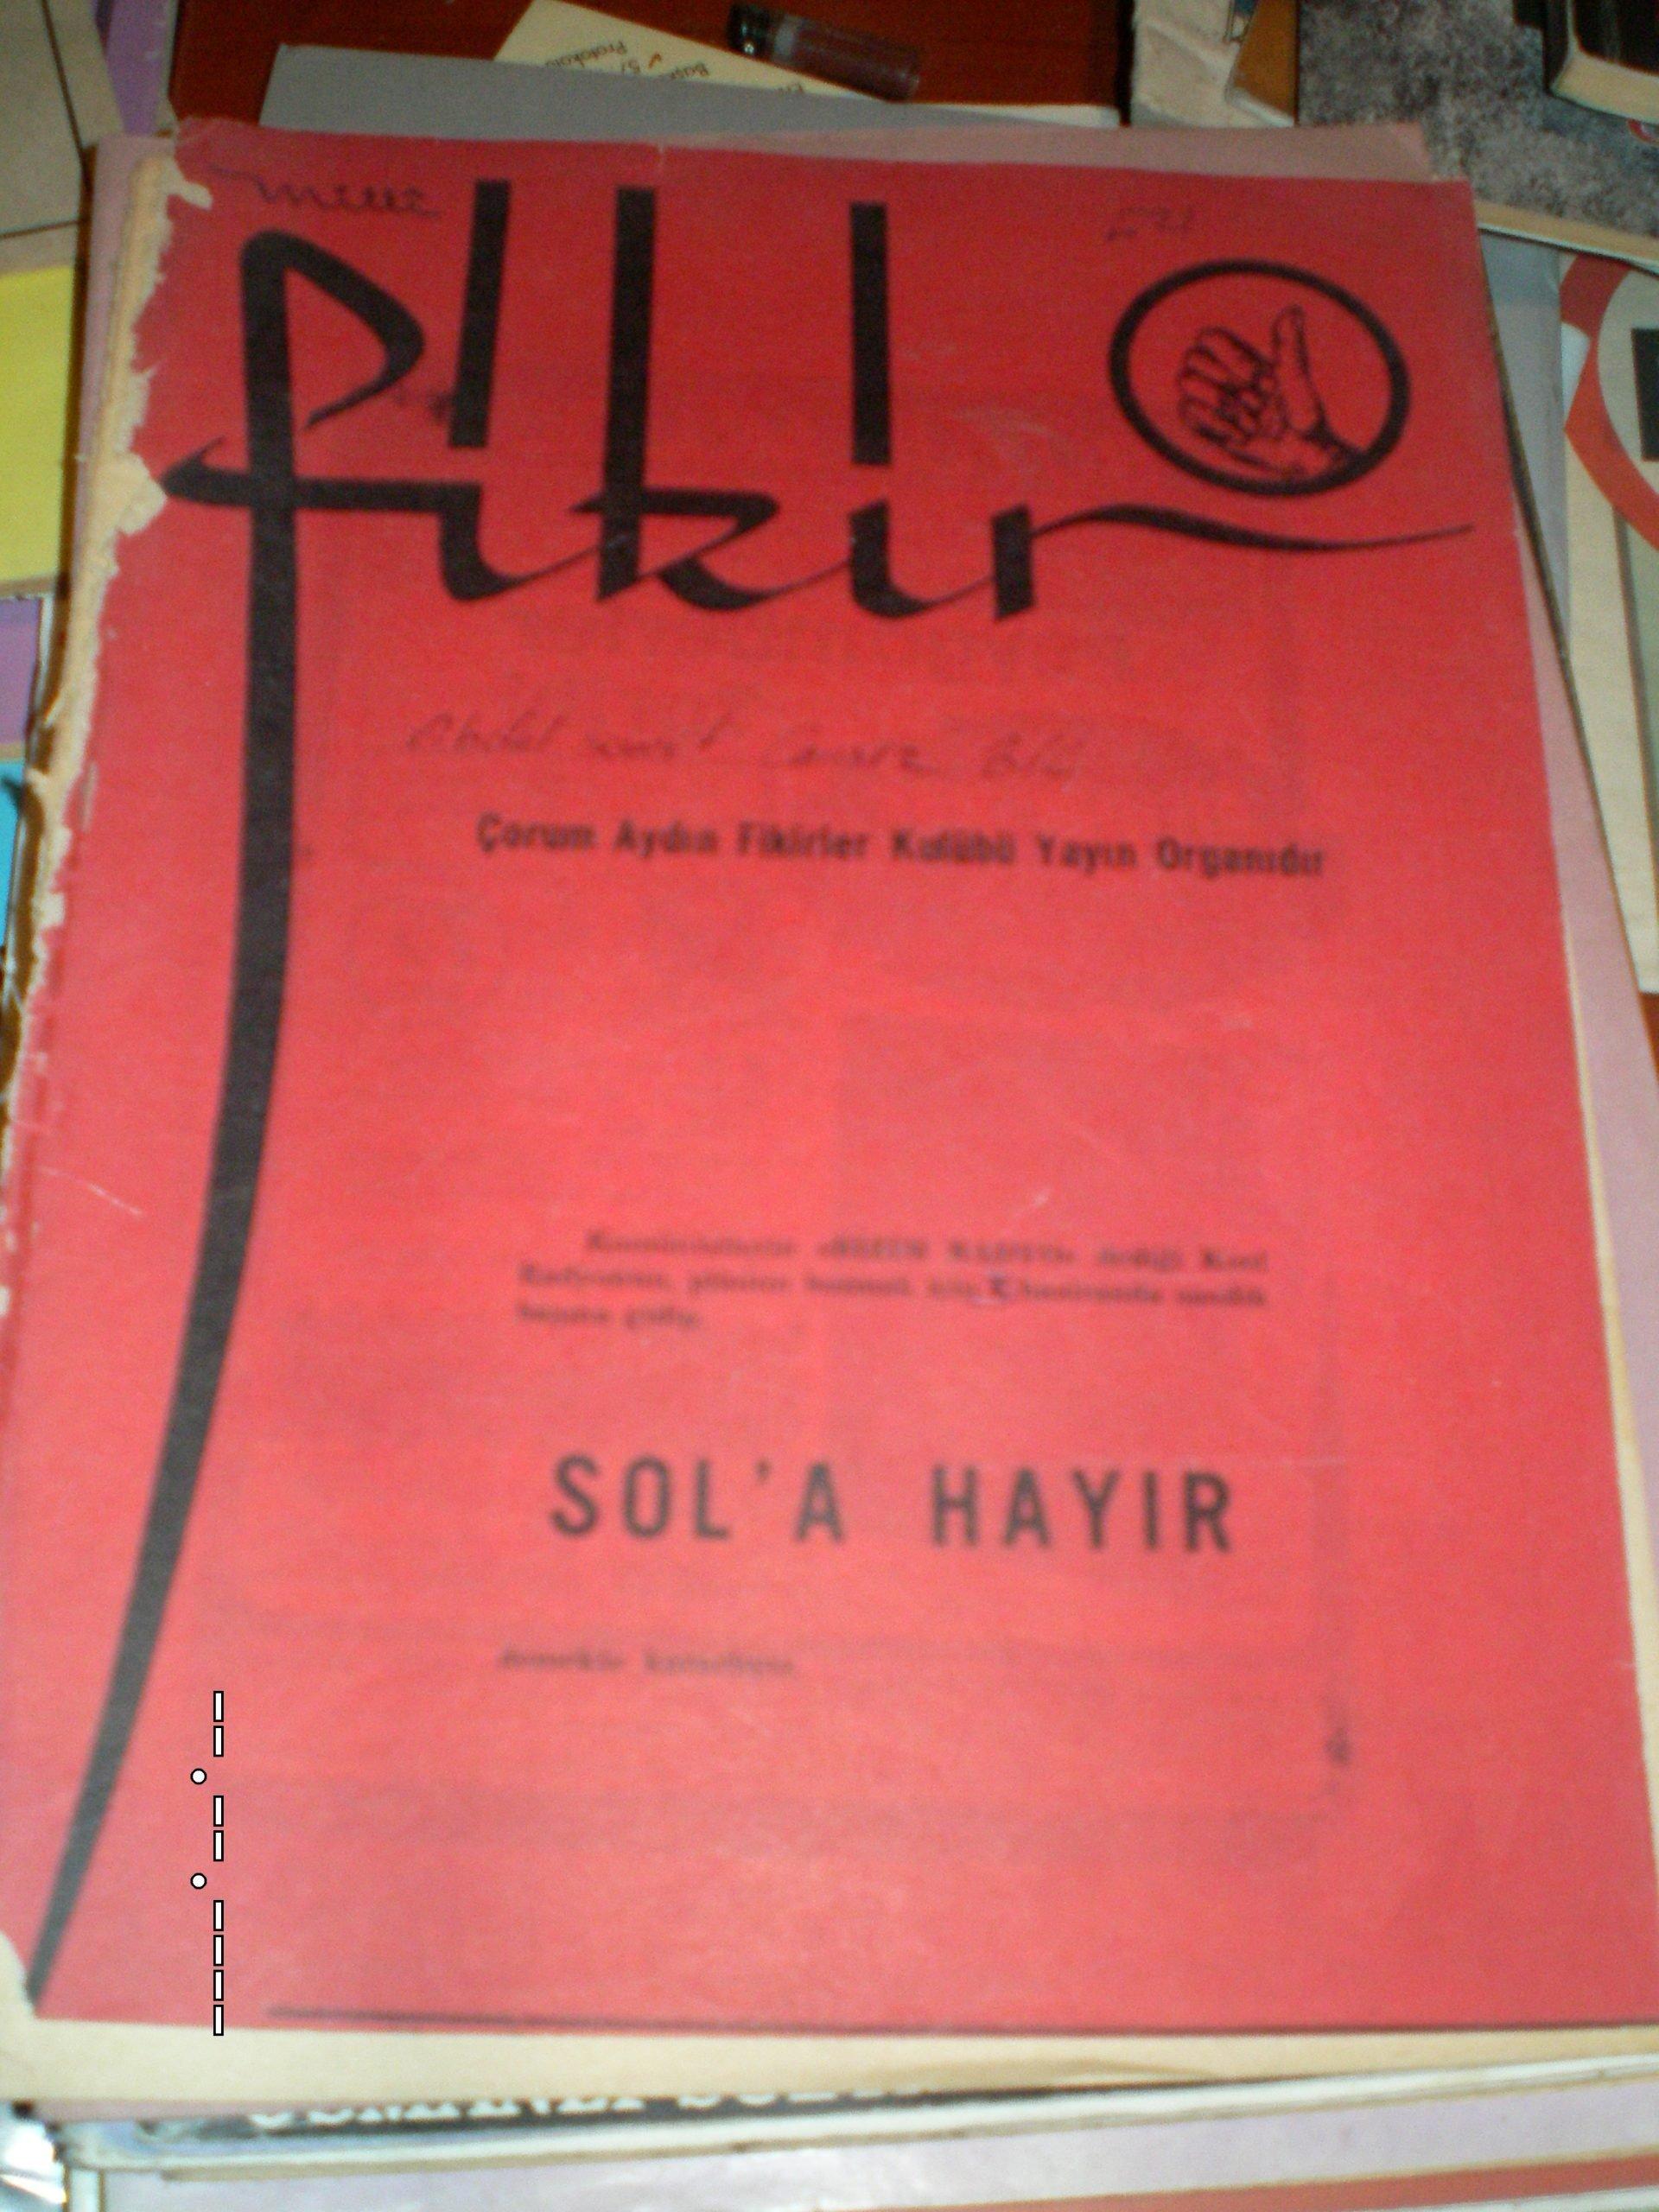 Milli FİKİR-Aylık dergi/ 10 tl